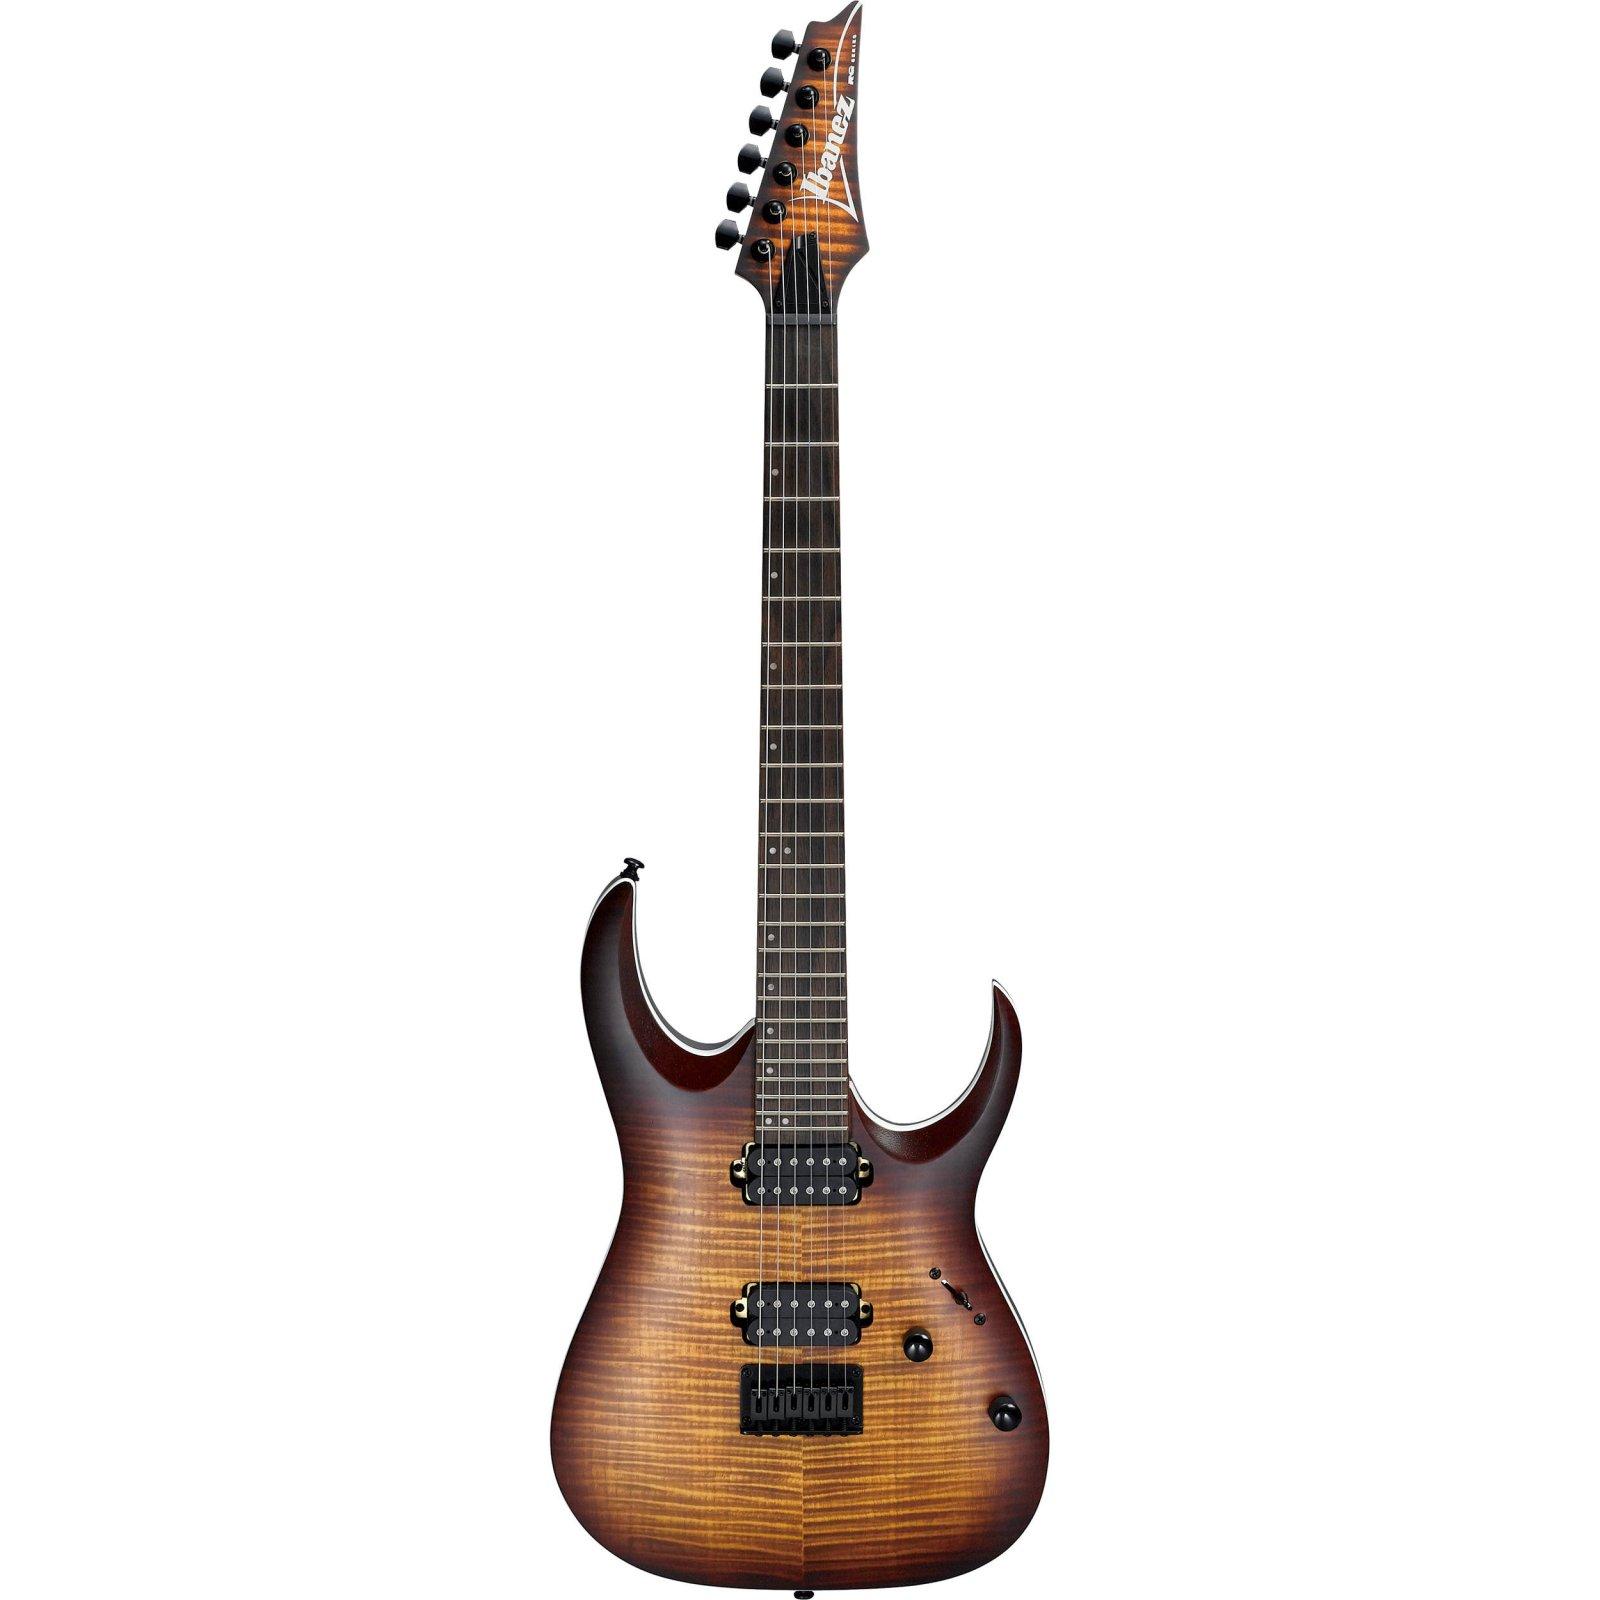 Ibanez RGA Standard 6str Electric Guitar - Dragon Eye Burst Flat